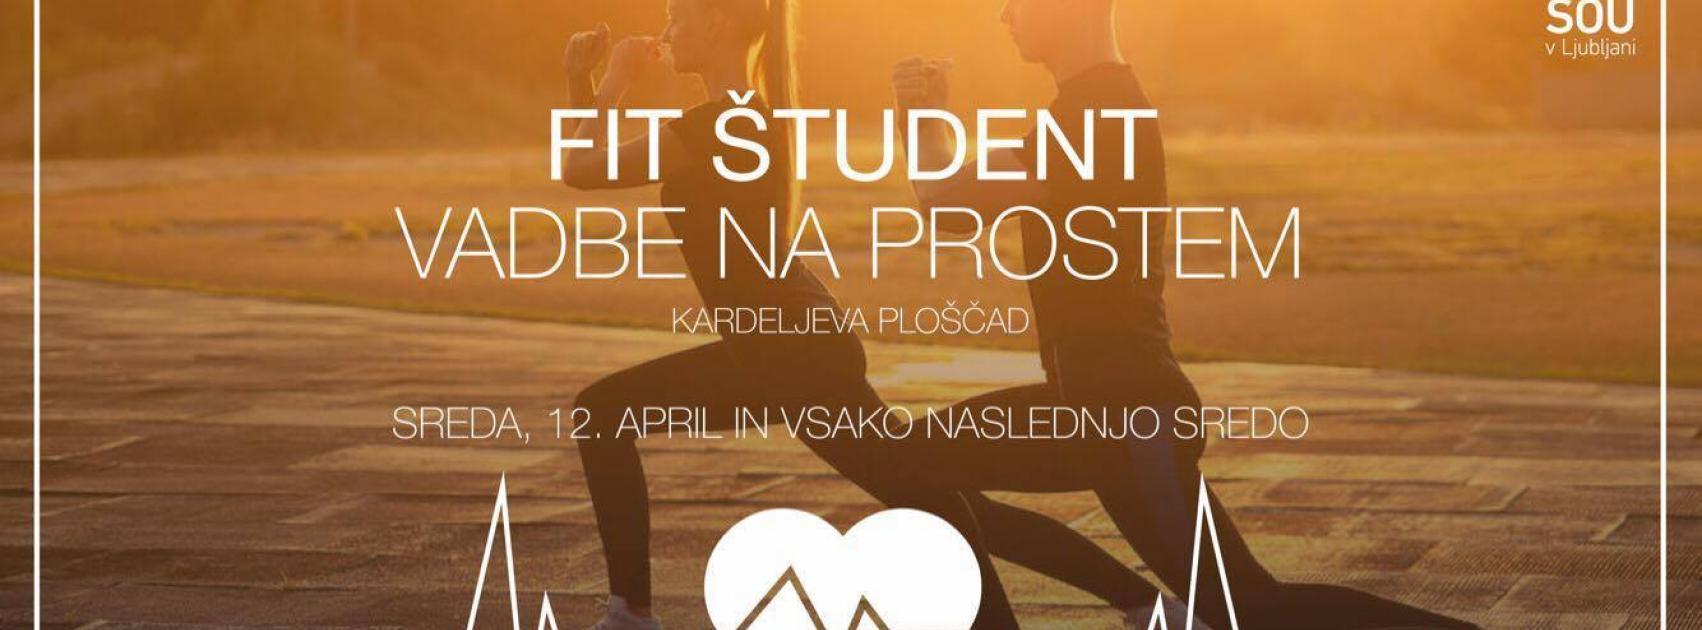 fit_student_vadbe_na_prostem_4.jpg